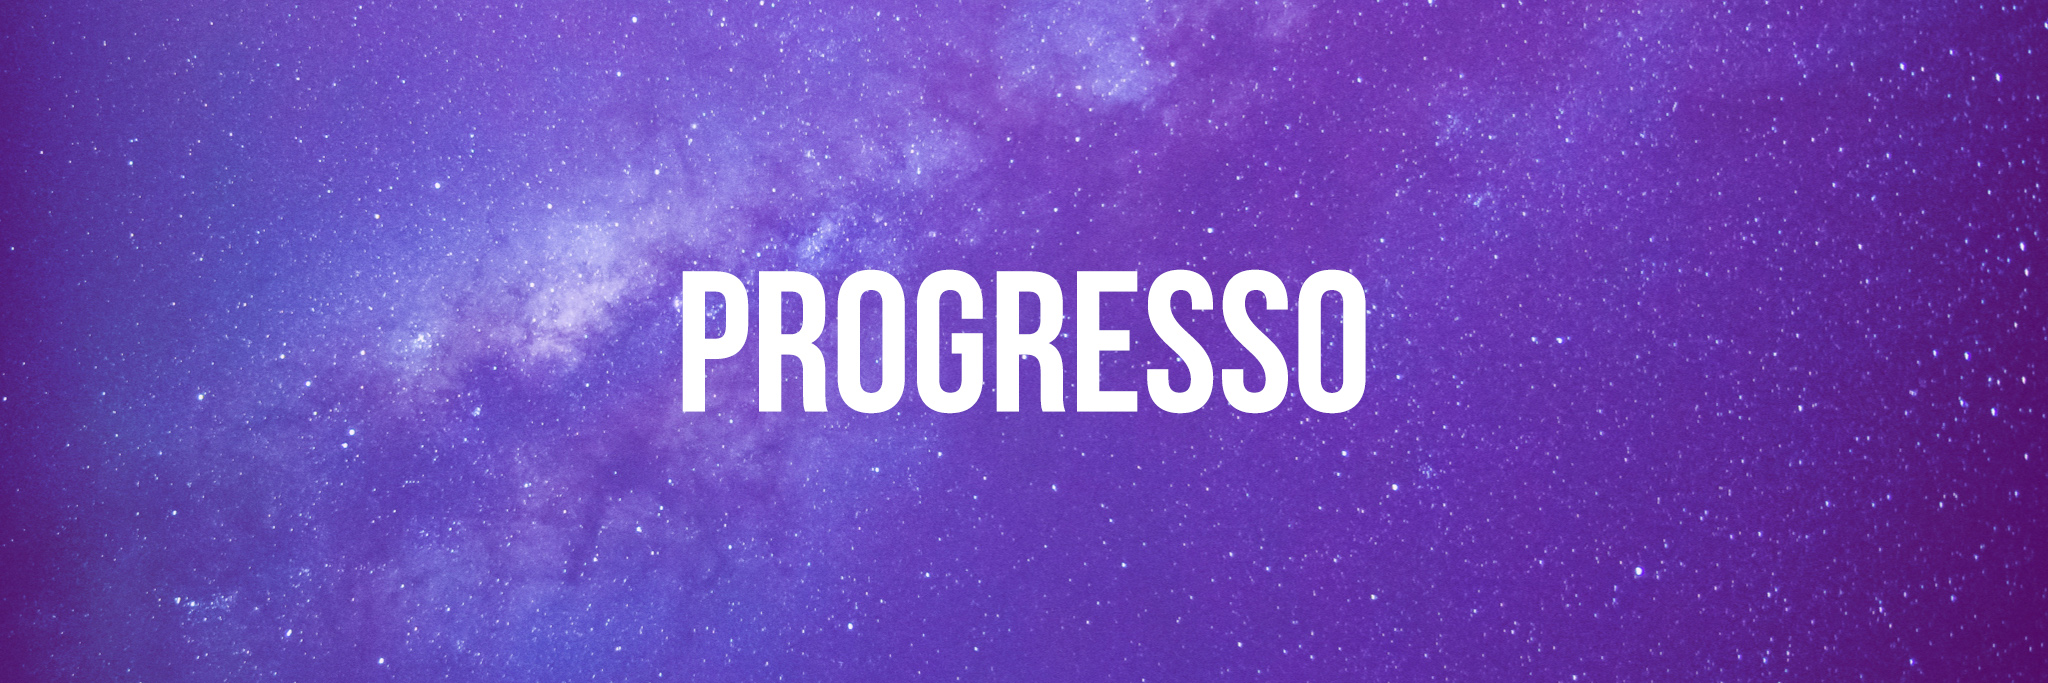 italian progress.jpg